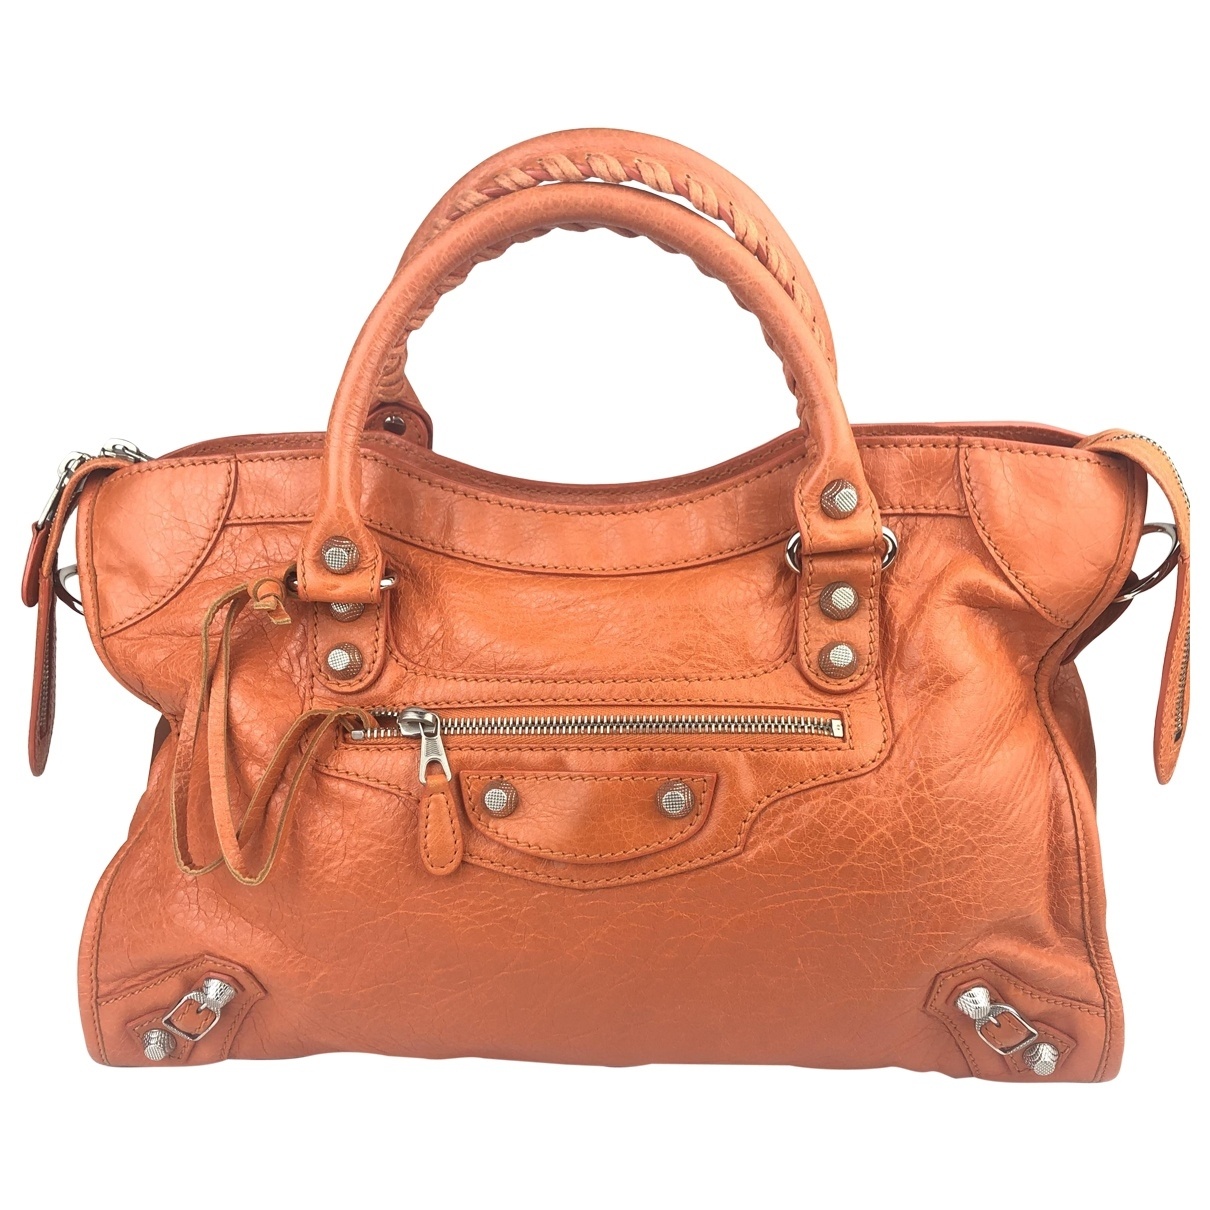 Balenciaga City Handtasche in  Orange Leder